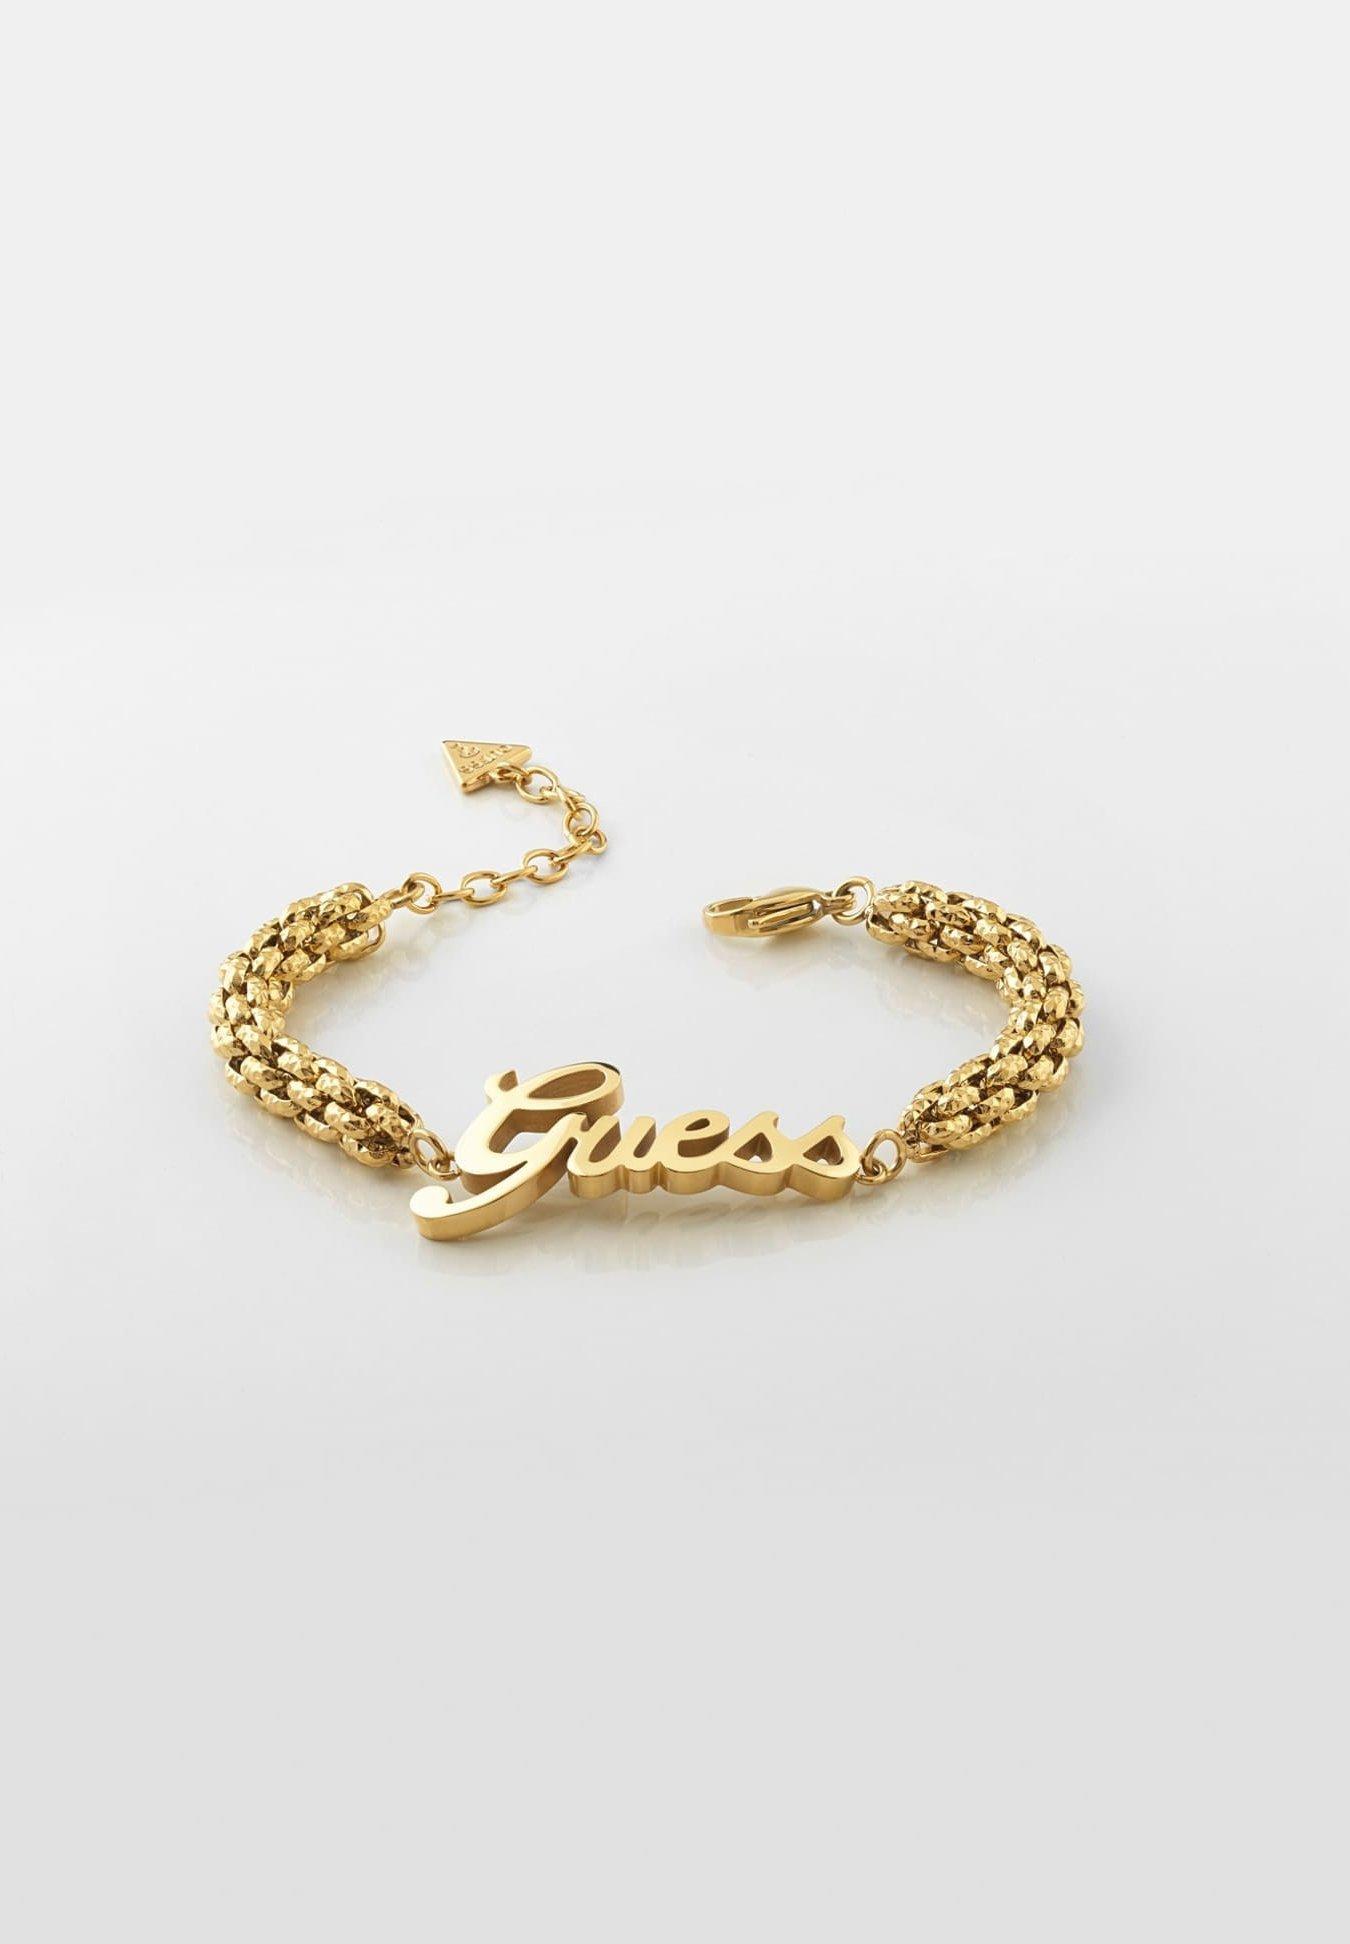 Low Price Sale Factory Sale Accessories Guess LOGO POWER Bracelet gold 4iVjEG4HD xItxODKz6